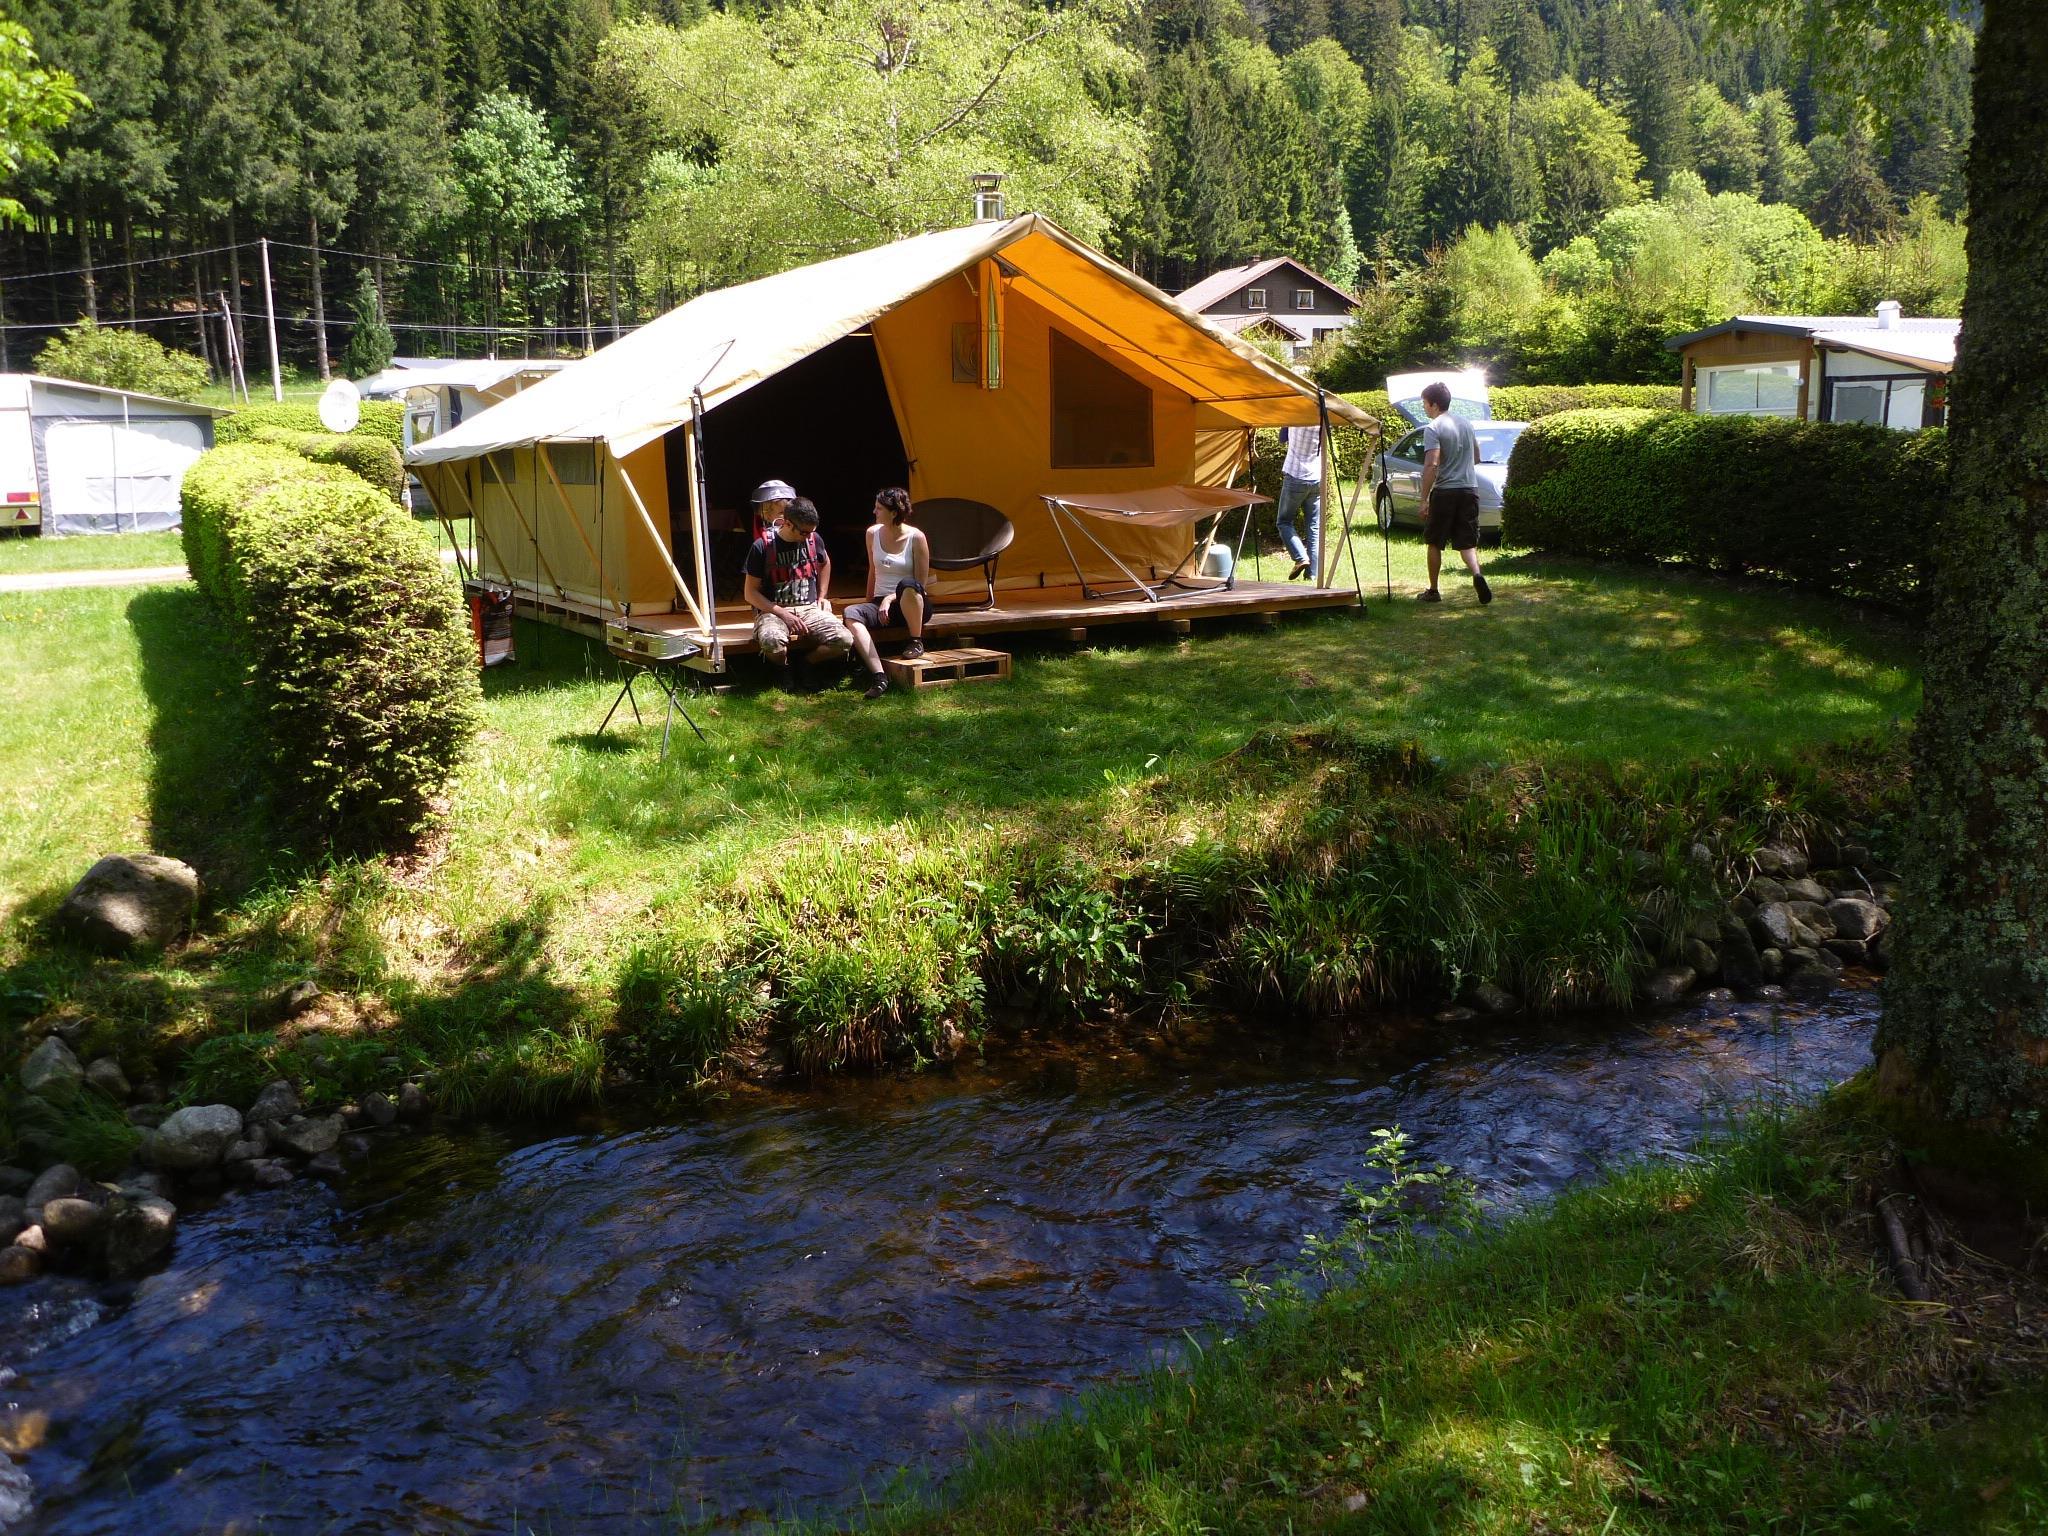 Location - Confort Tente Lodge Nature 25M² (2 Chambres) + Terrasse - Sans Sanitaires - 2013 - Flower Camping Verte Vallee